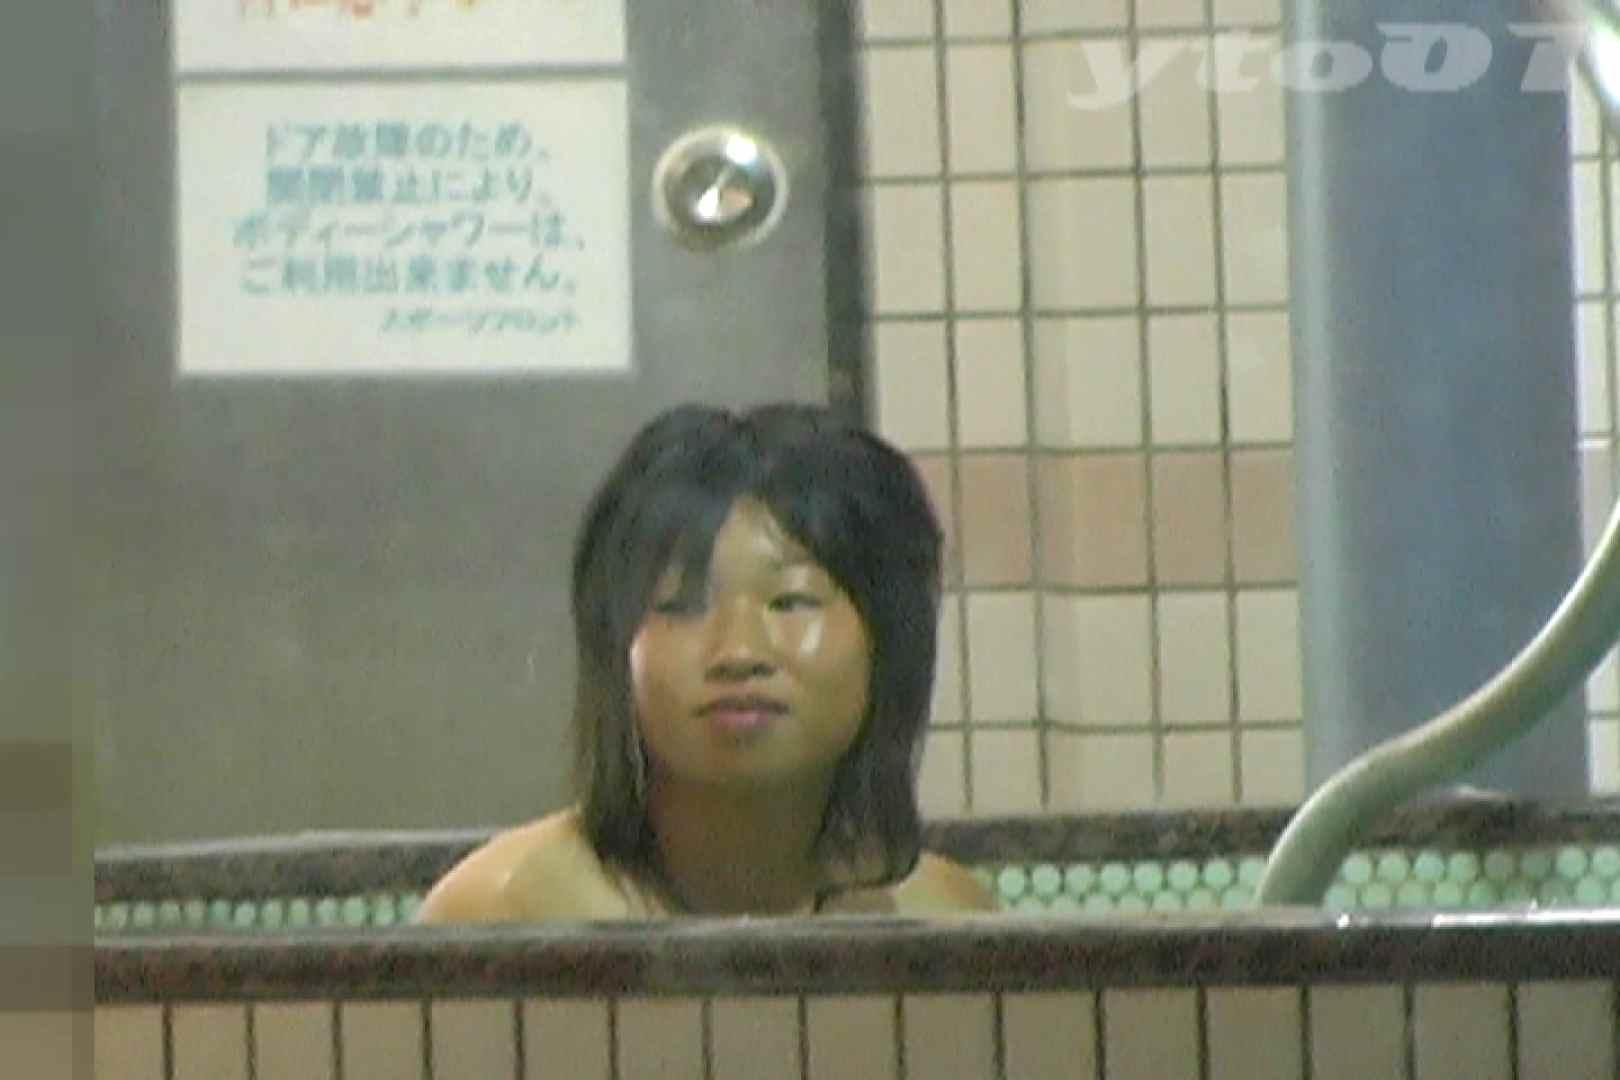 ▲復活限定▲合宿ホテル女風呂盗撮 Vol.07 0 | 0  92画像 53